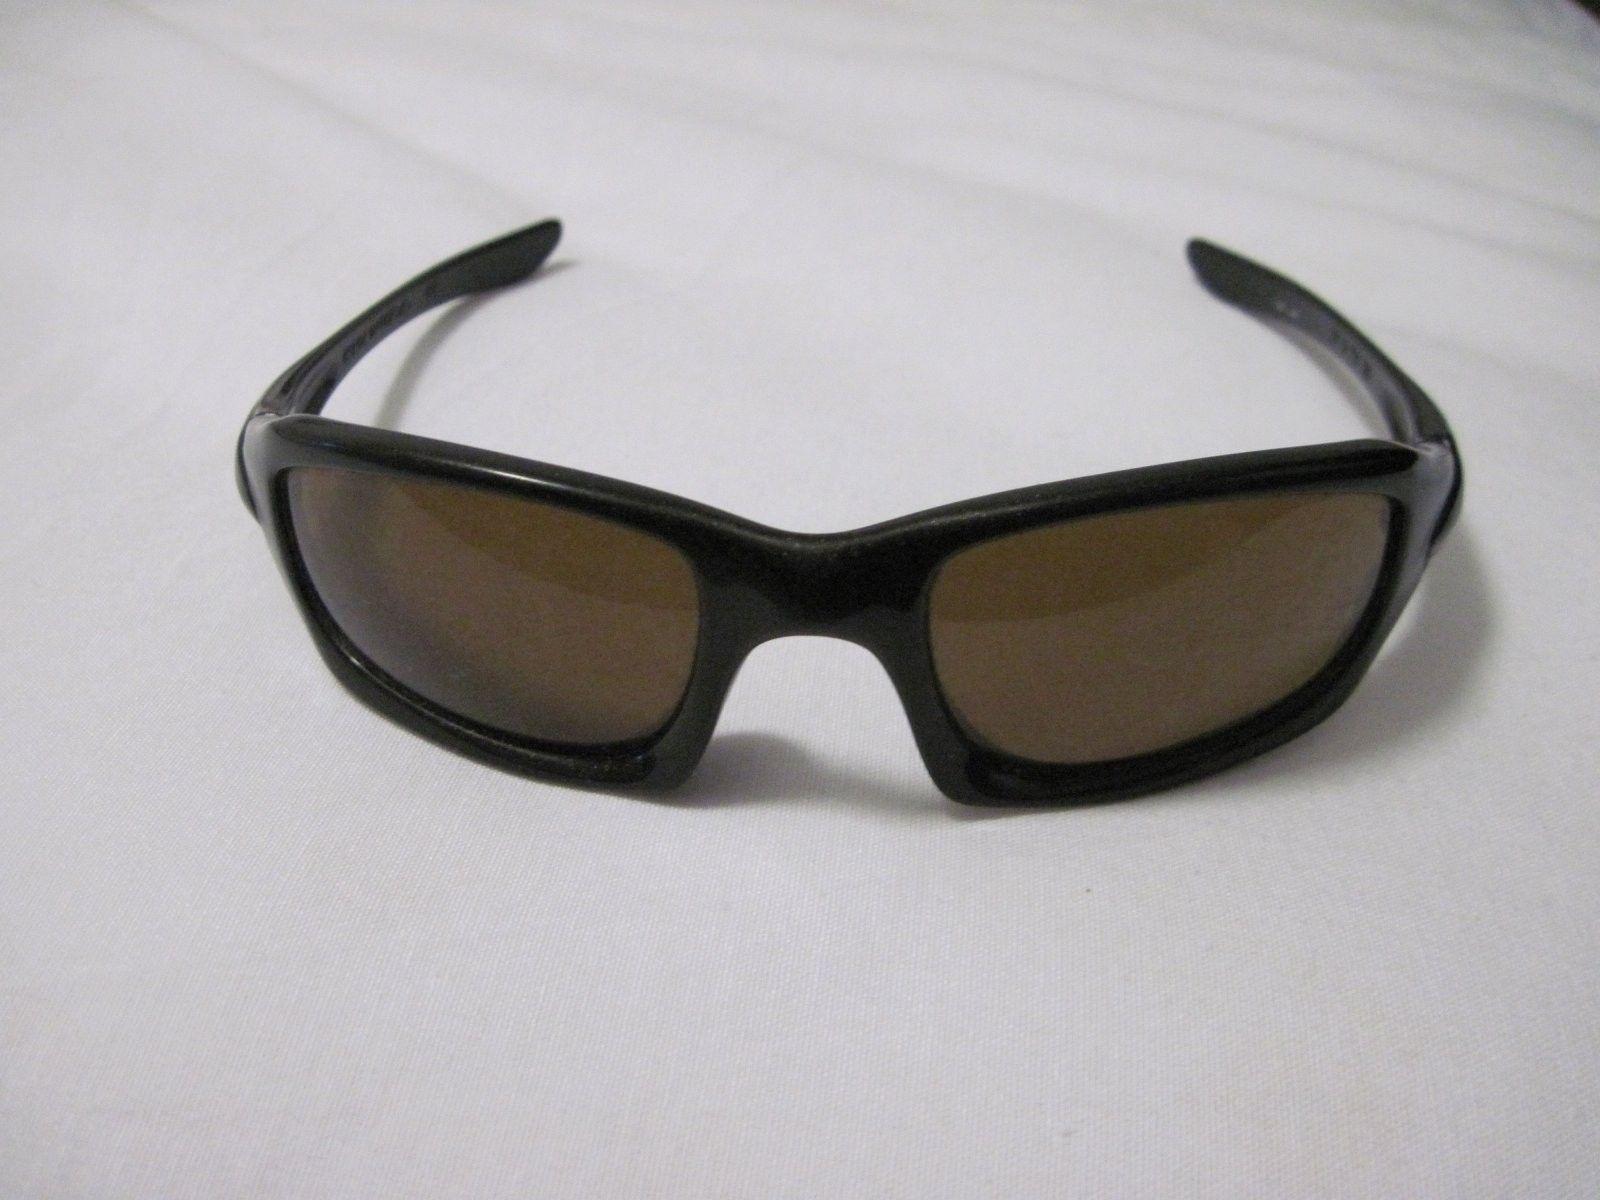 Need Help Identifying What Model Sunglasses - IMG_1409.JPG